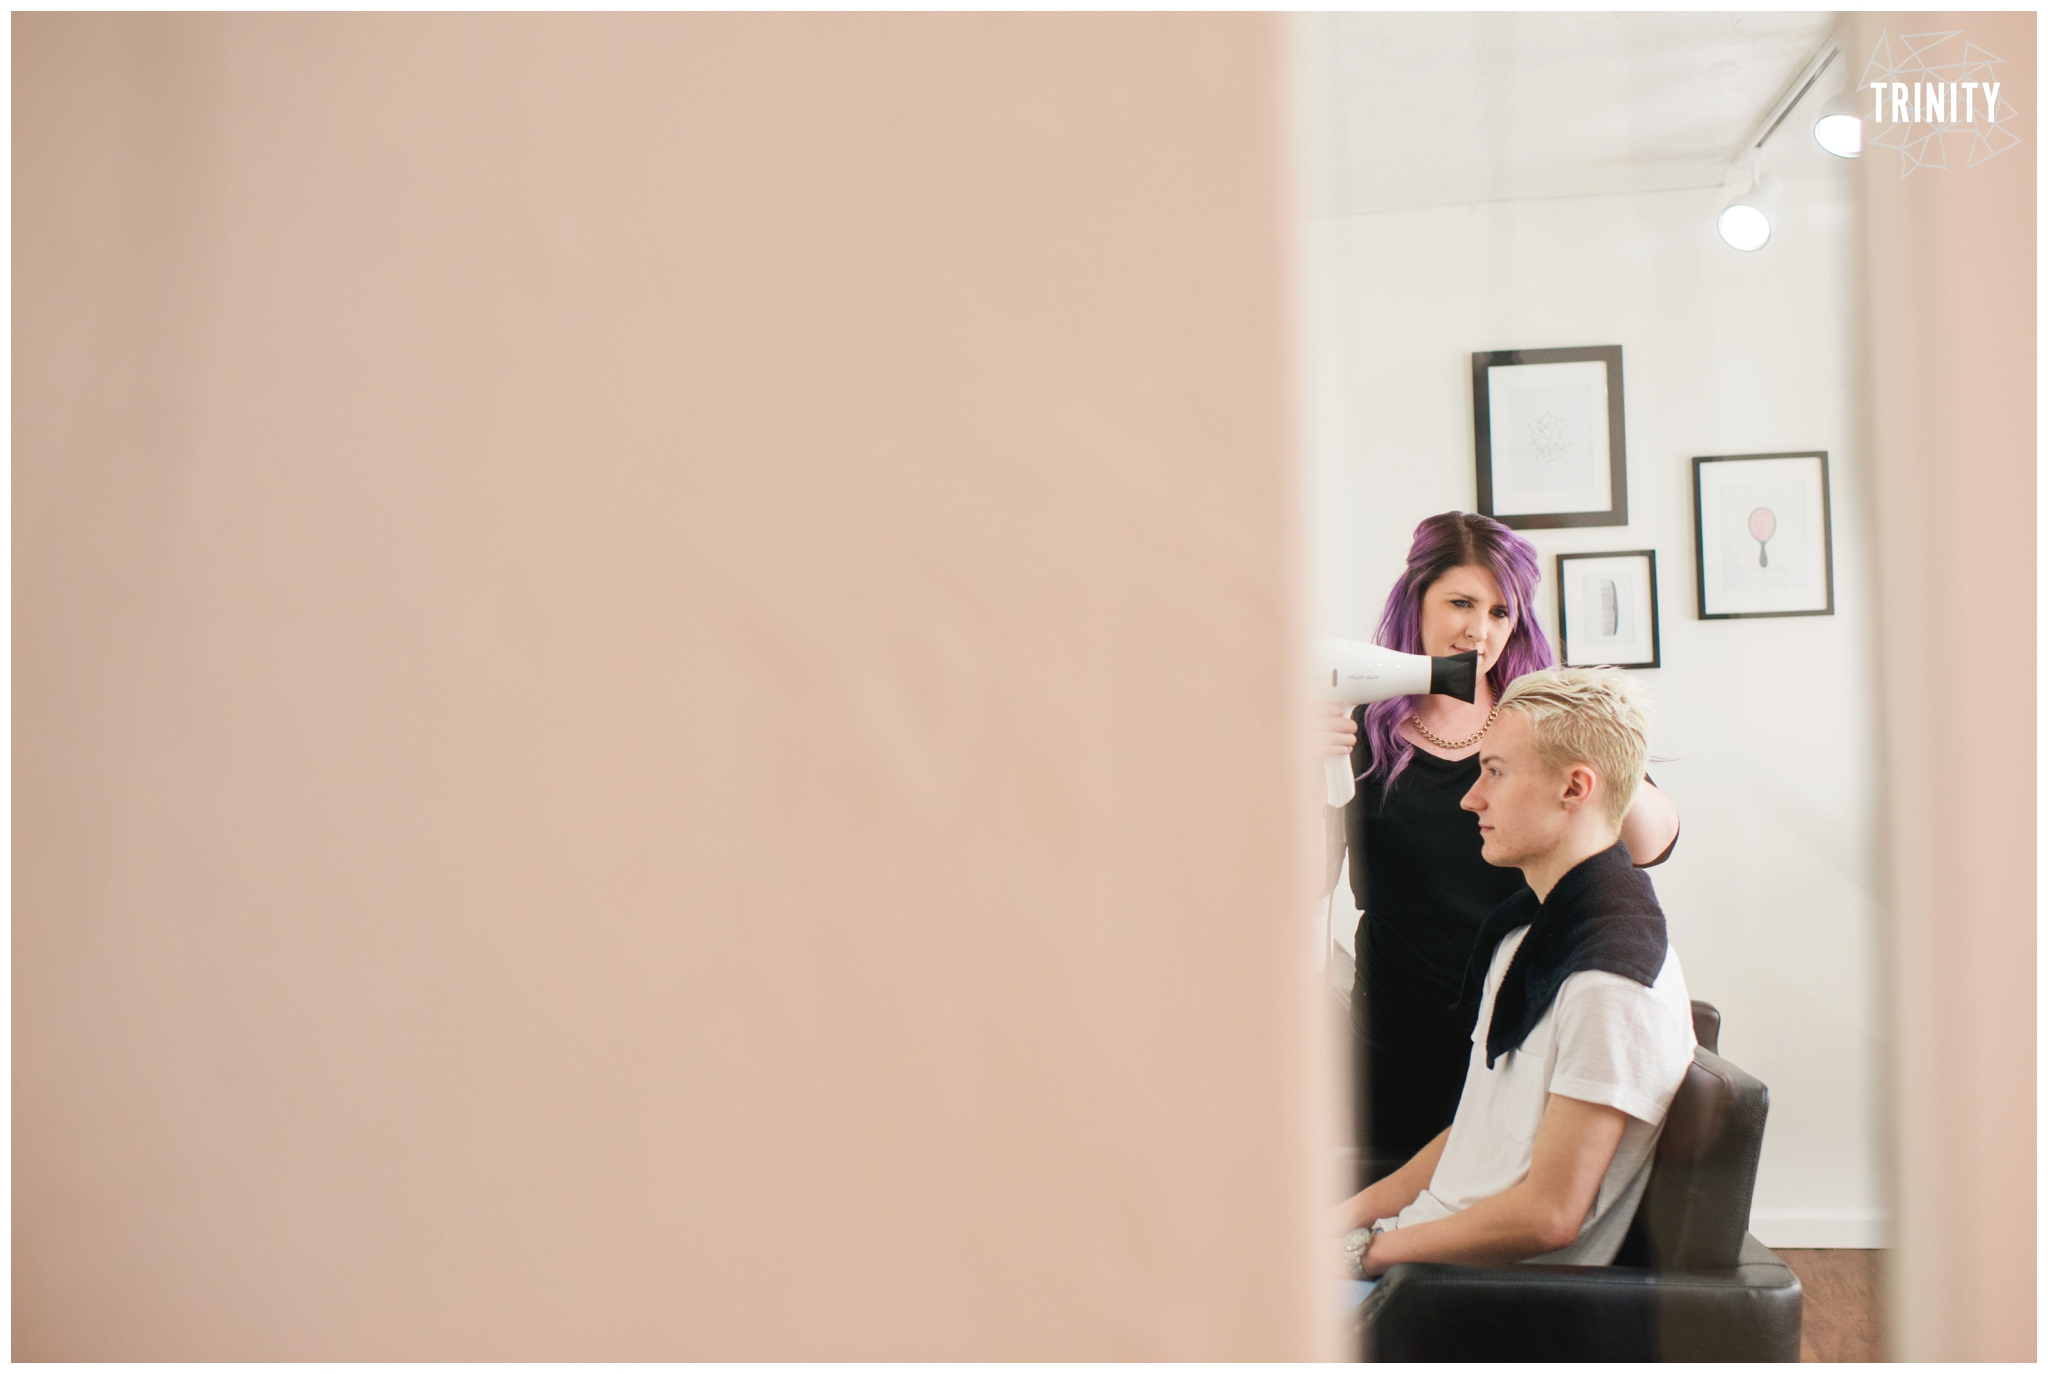 BEAUTOLOGY-salon-PROOFS-8156_WEBstomp.jpg